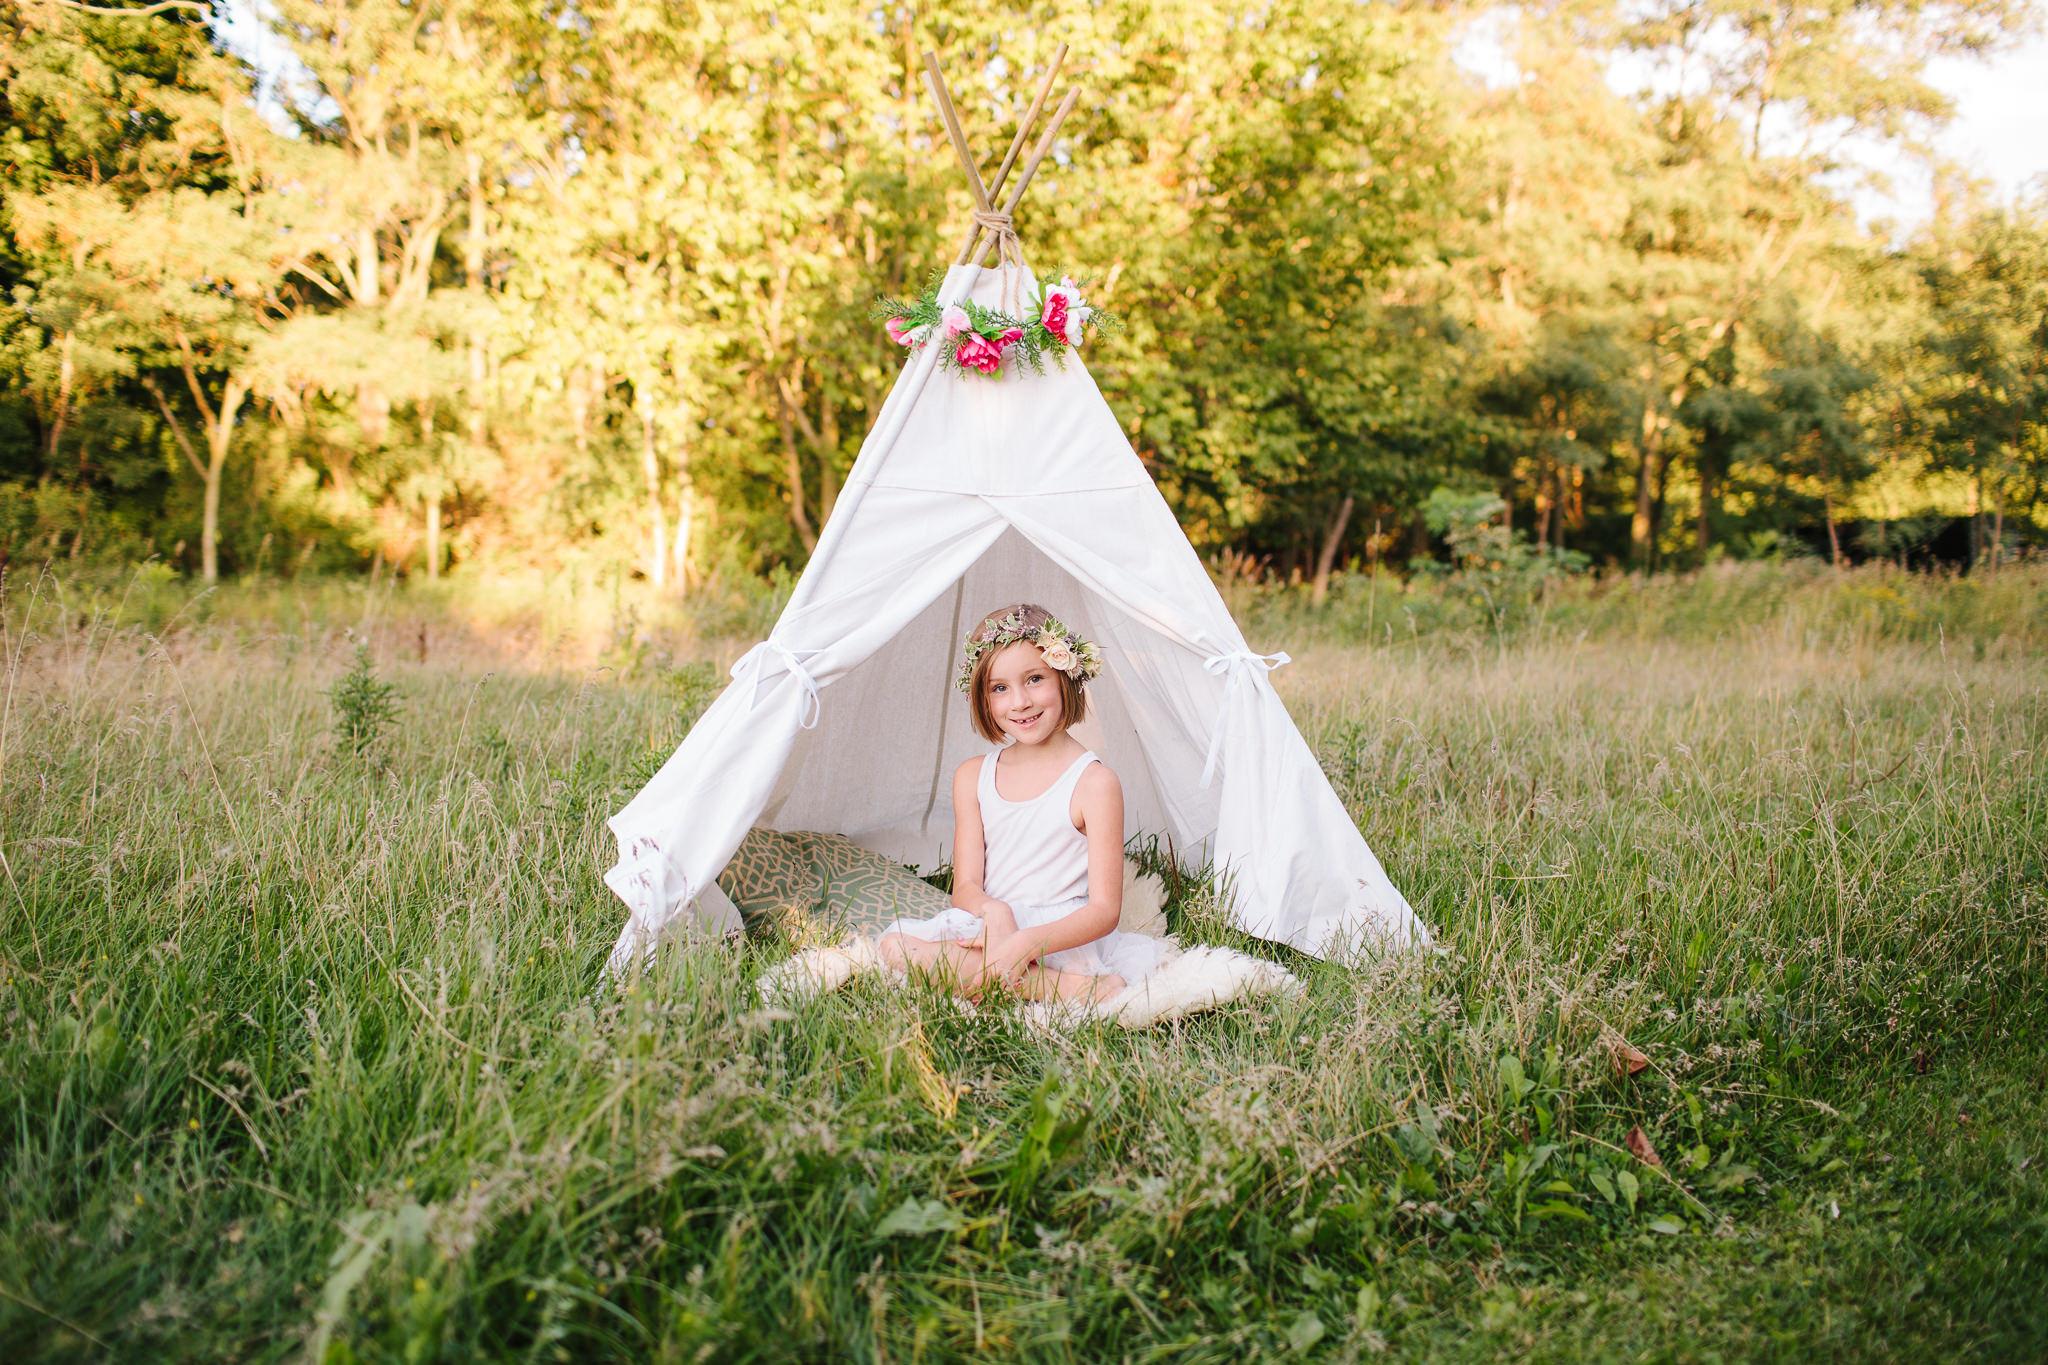 girl sitting in teepee in lindsay on field